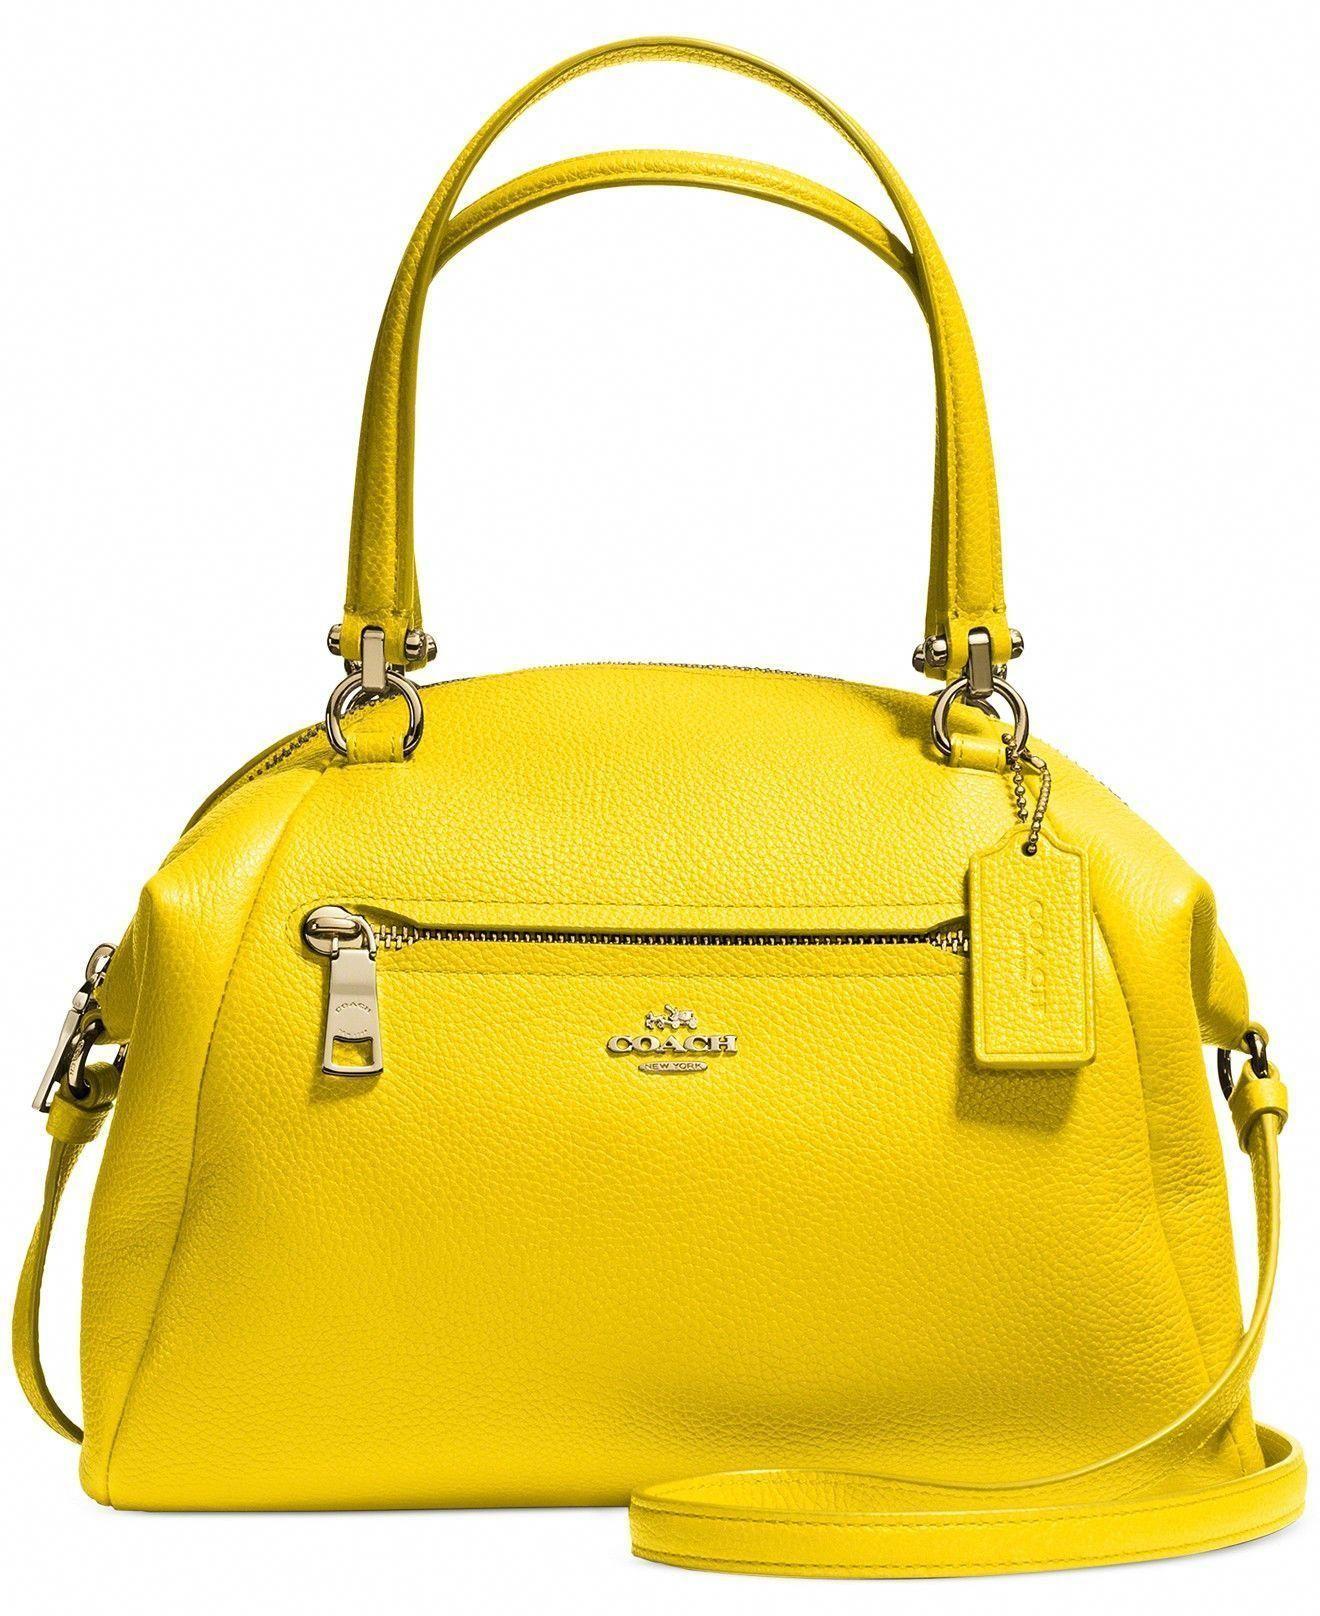 2568777e08 COACH PRAIRIE SATCHEL IN PEBBLE LEATHER - COACH - Handbags Accessories -  Macys #Designerhandbags #coachpebbleleathercrossbodybag #pursesmacys